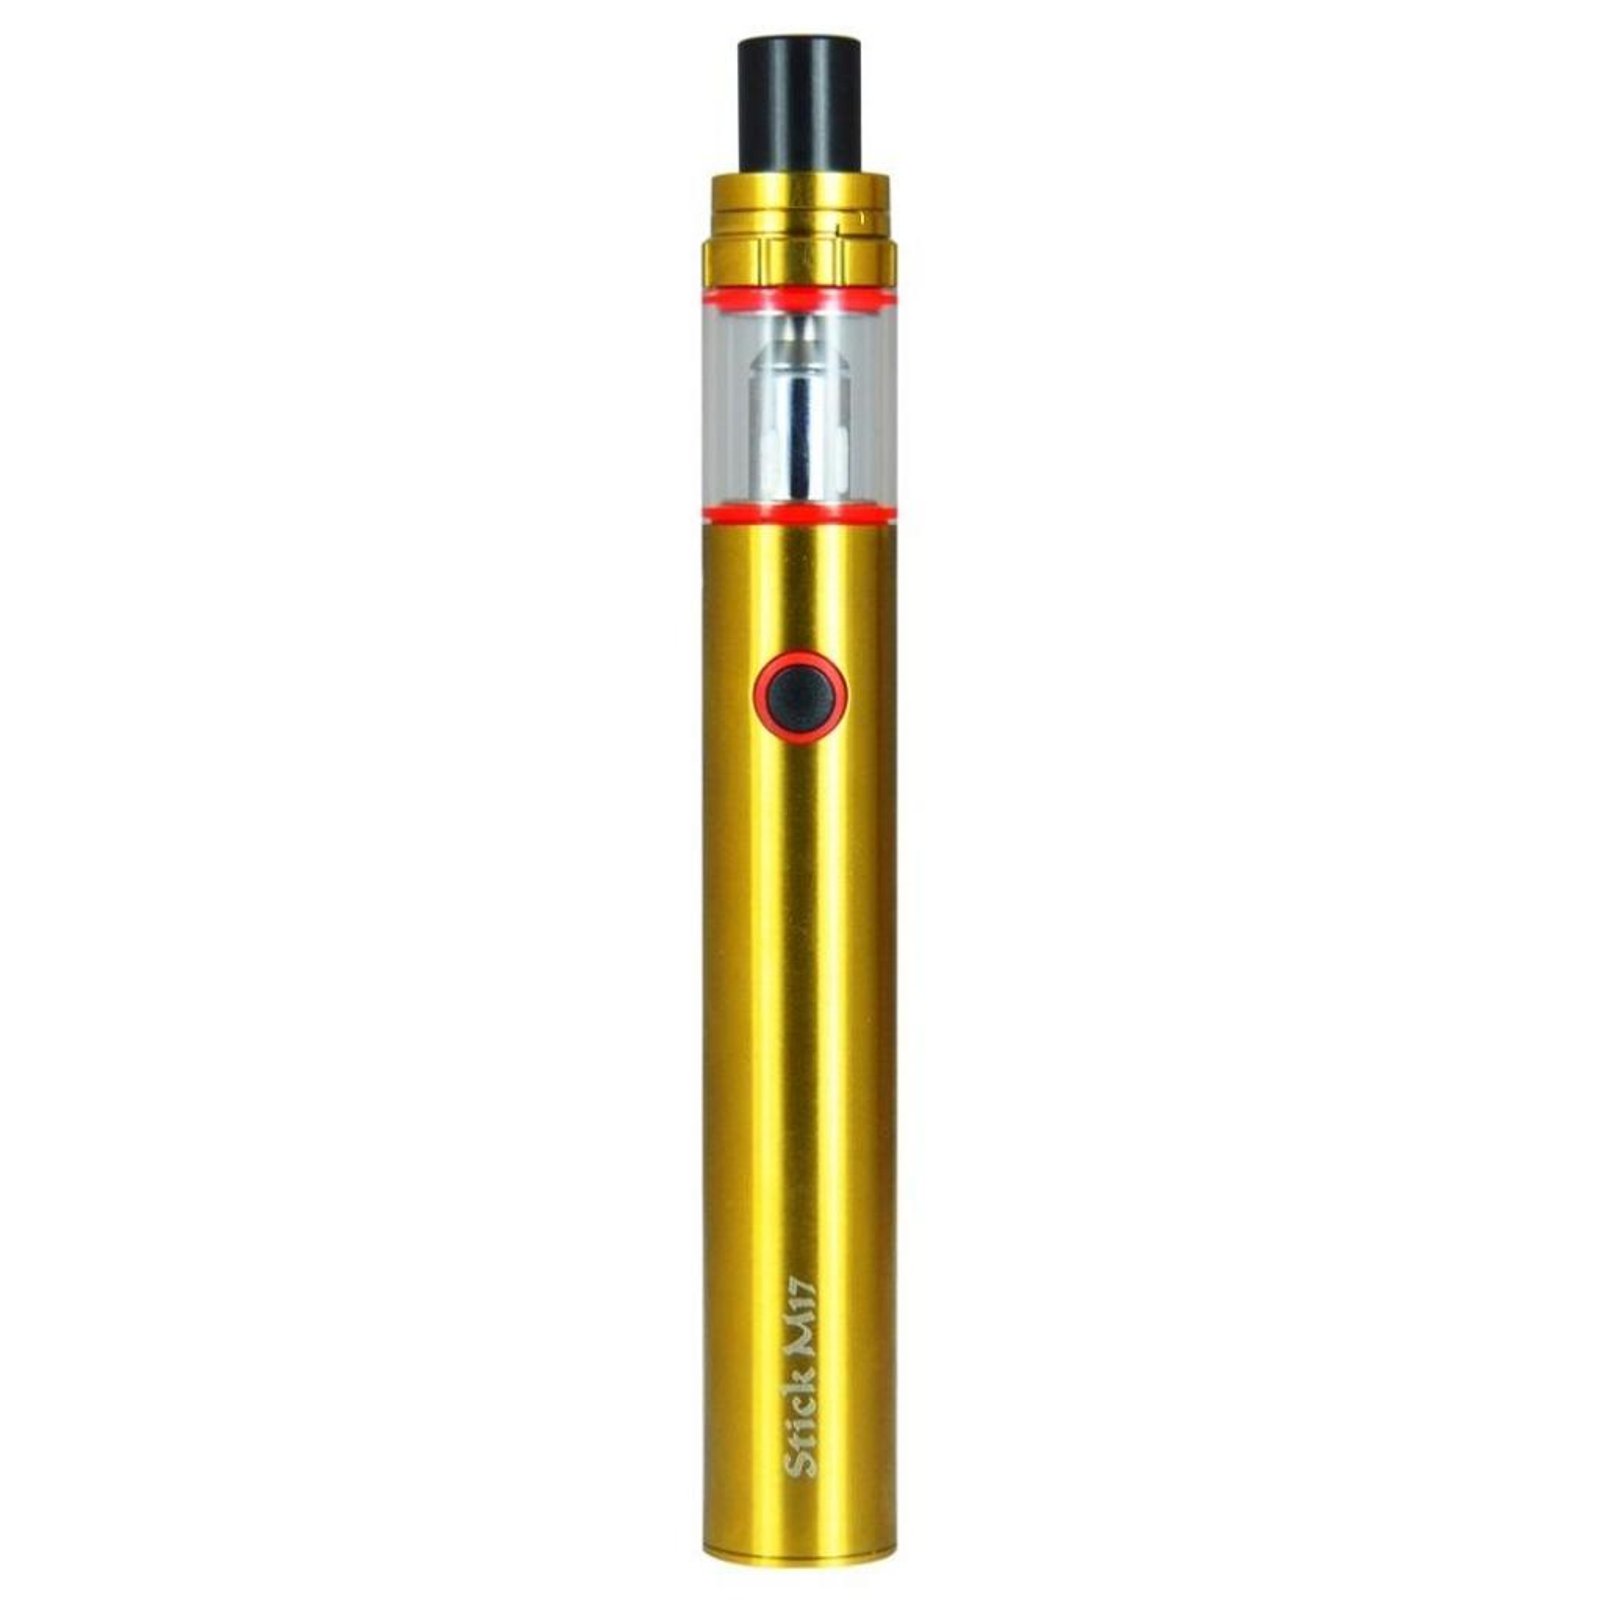 Стартовый набор Smok Stick M17 Gold (SMSM17G)